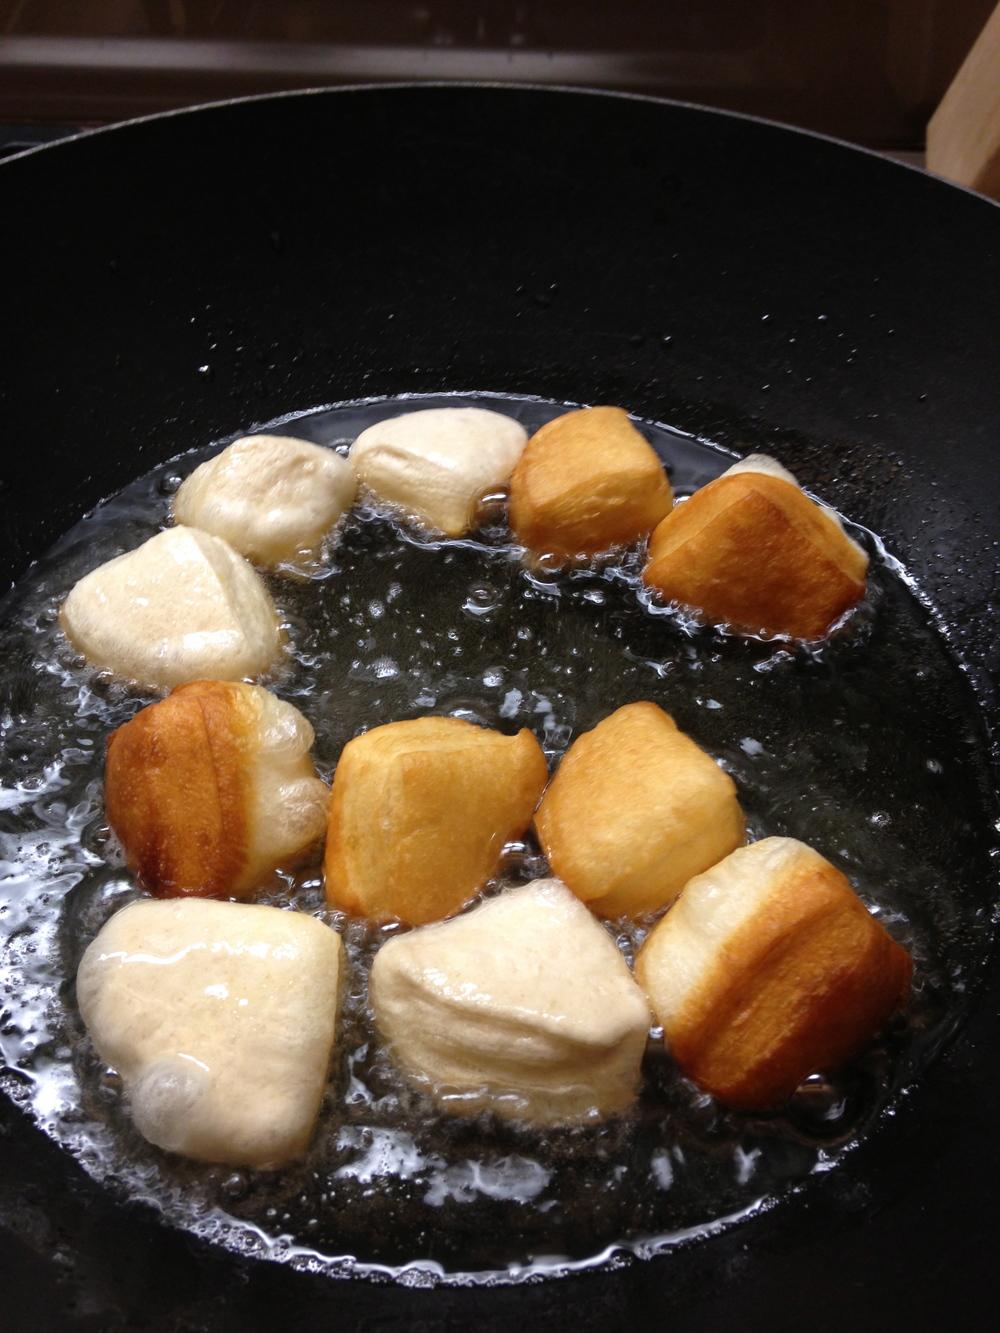 Deep fry until golden brown